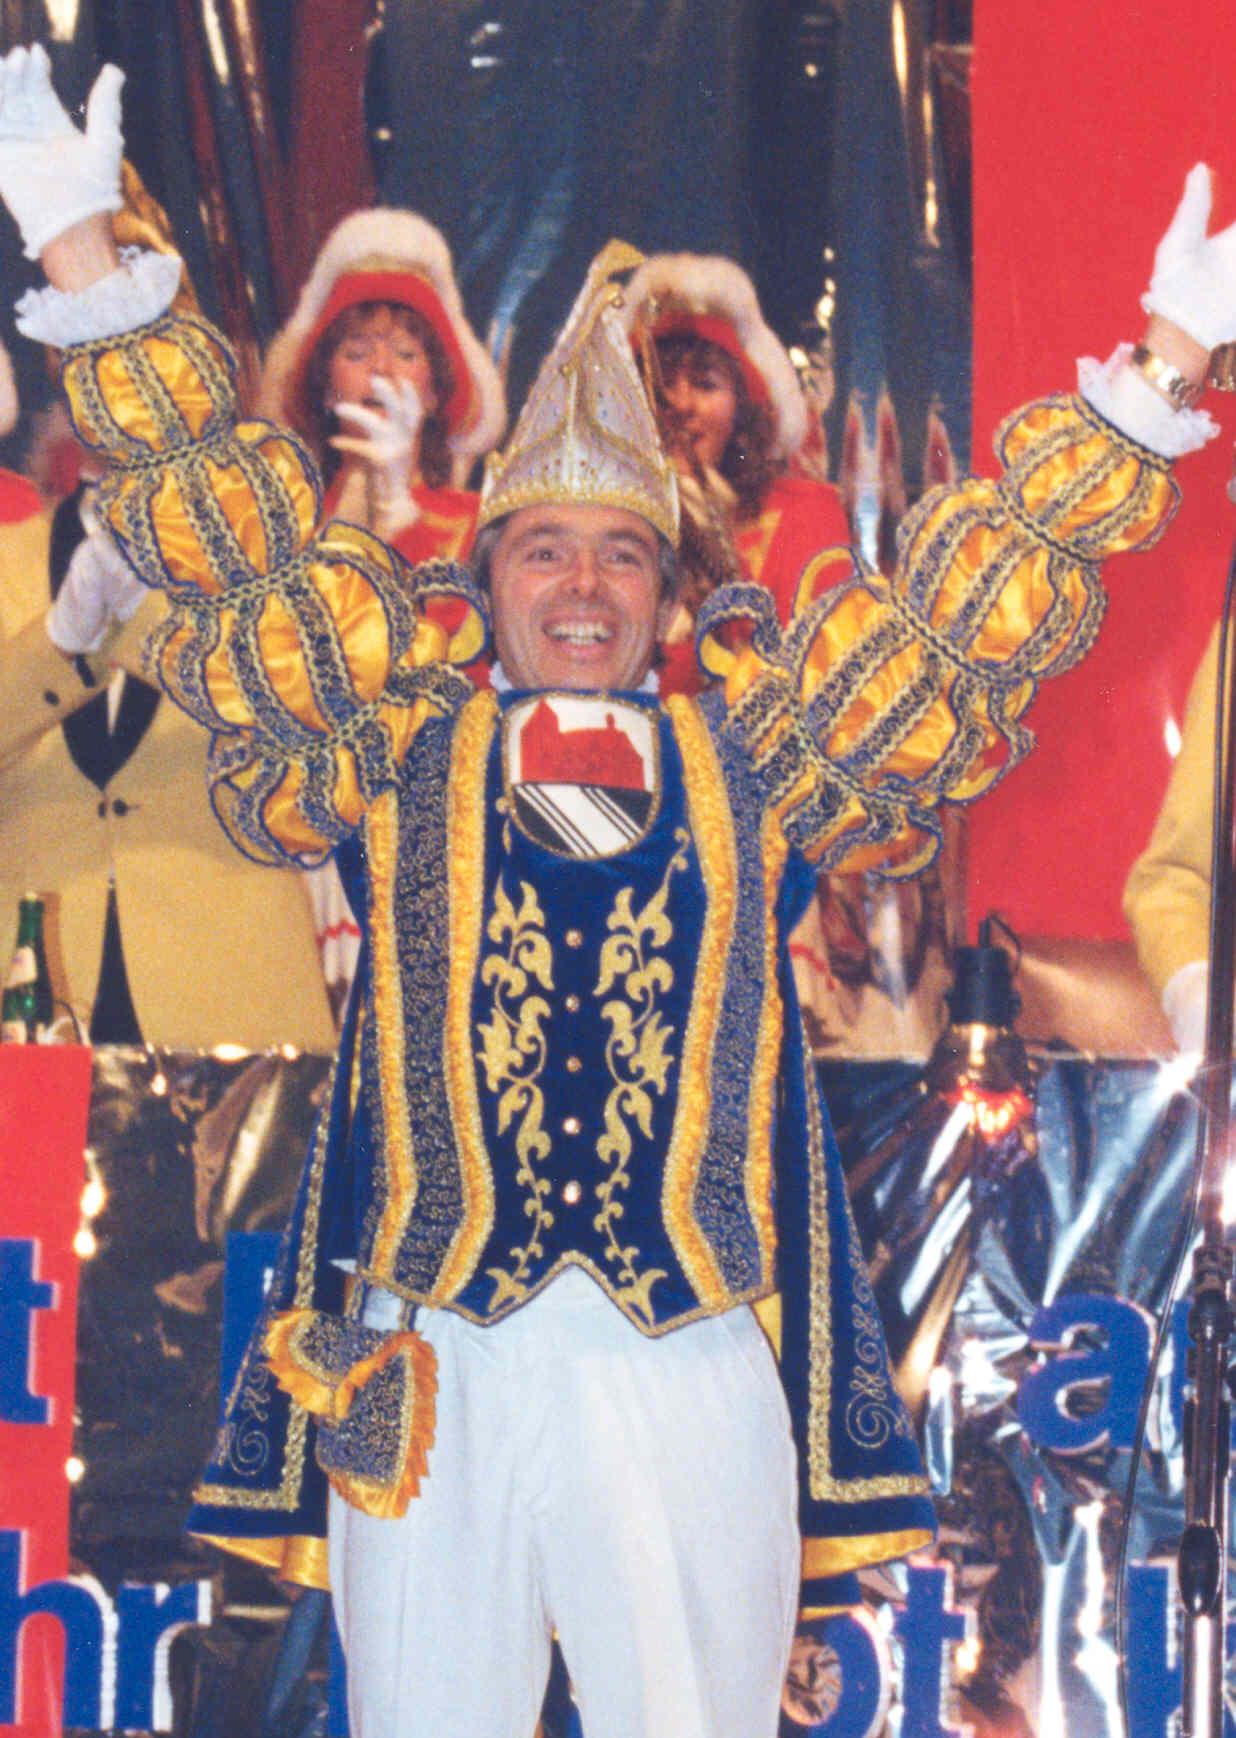 1984-Heinz I (Klecha)